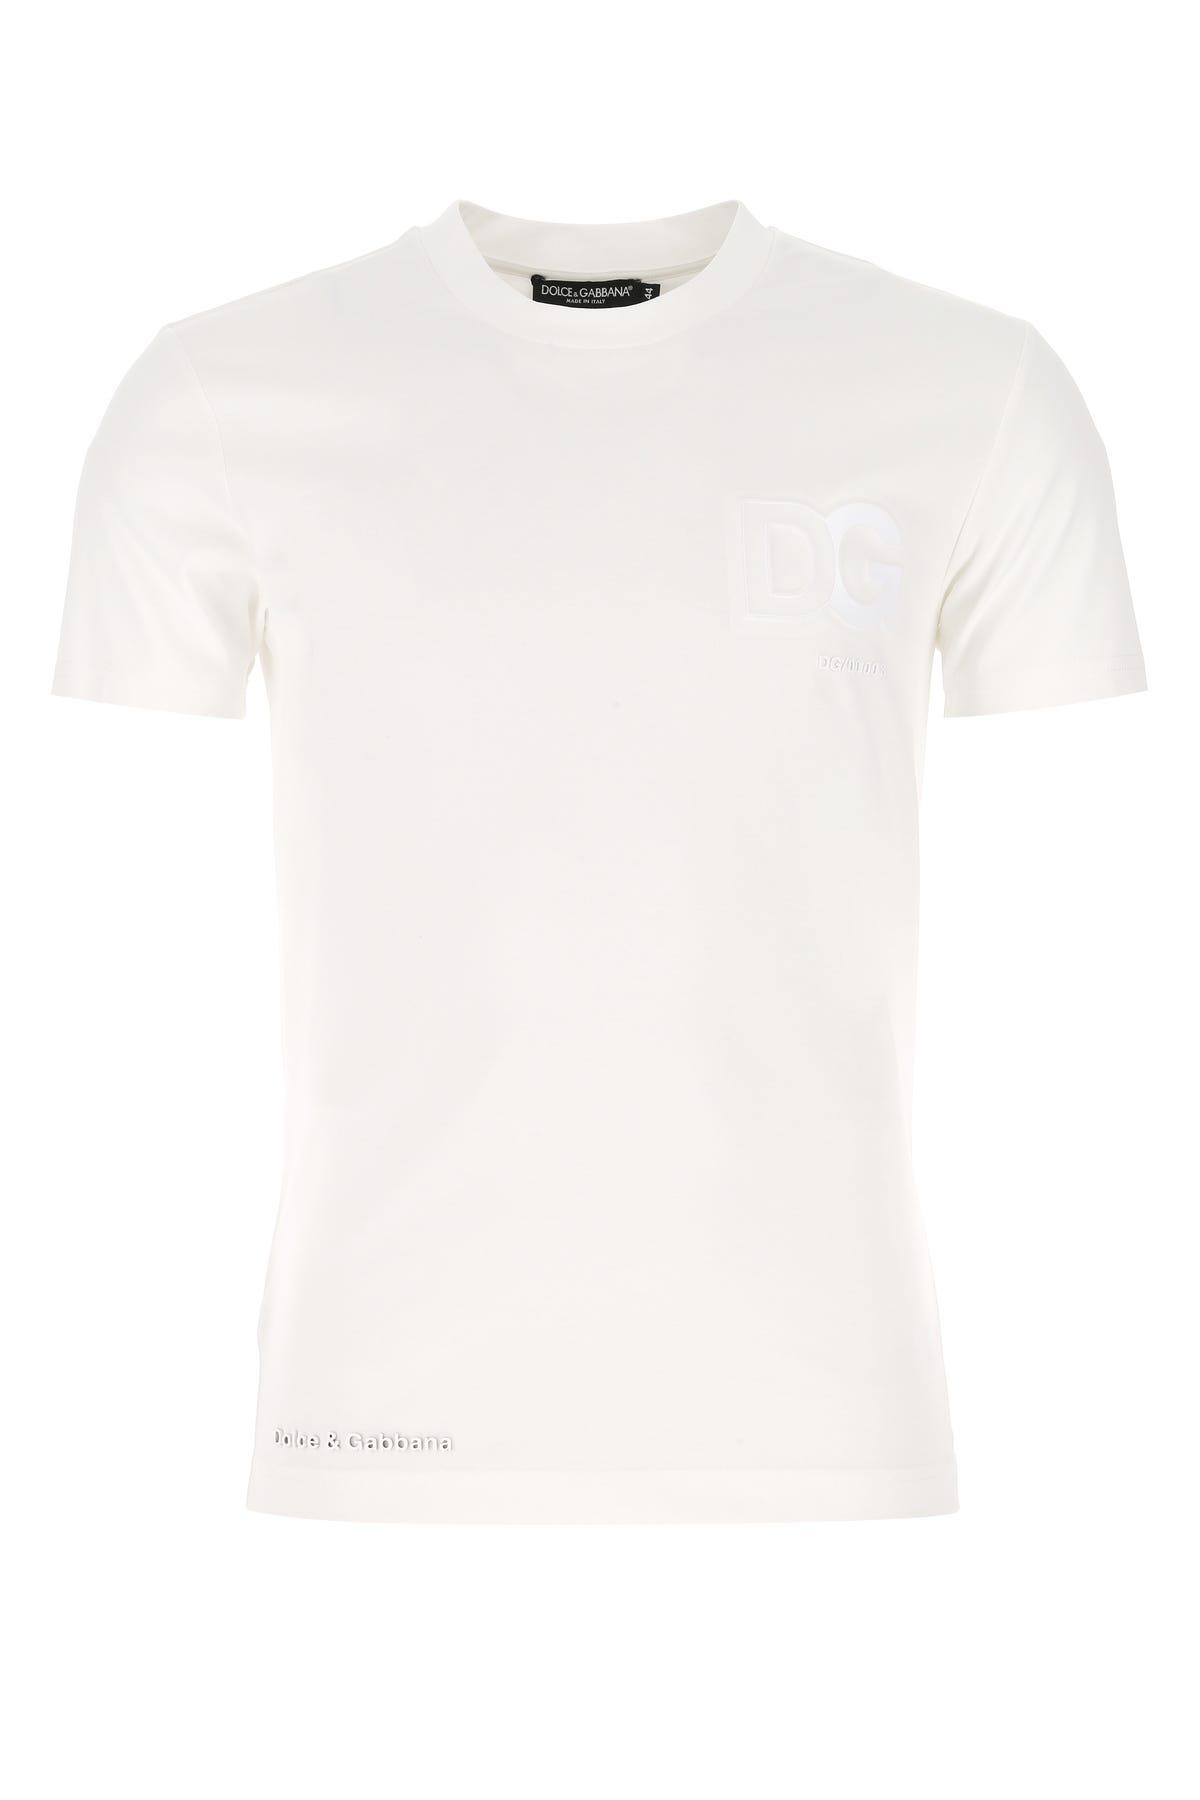 Dolce & Gabbana White Stretch Cotton Blend T-shirt  White Dolce & Gabbana Uomo 46